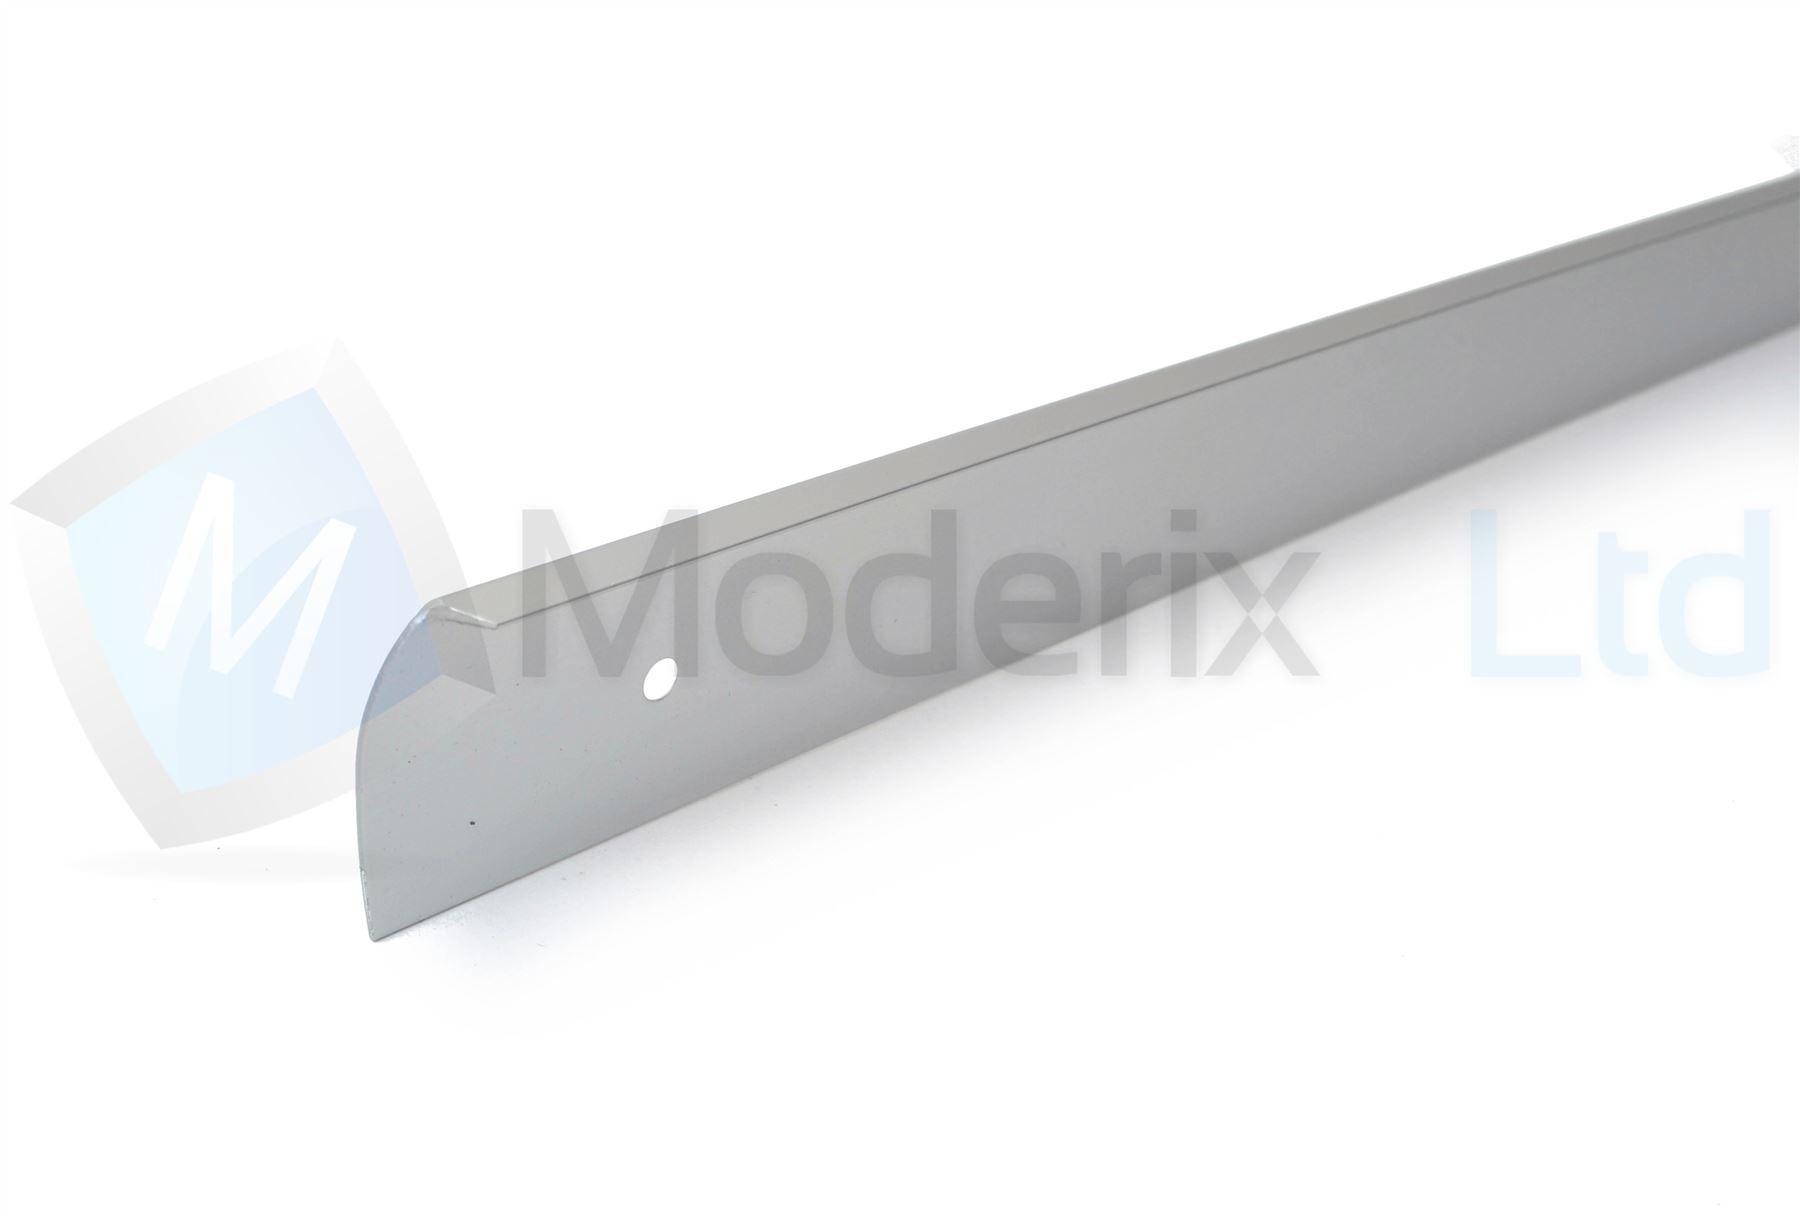 kitchen worktop edging corner joint trim strip aluminium end cap 30mm ebay. Black Bedroom Furniture Sets. Home Design Ideas